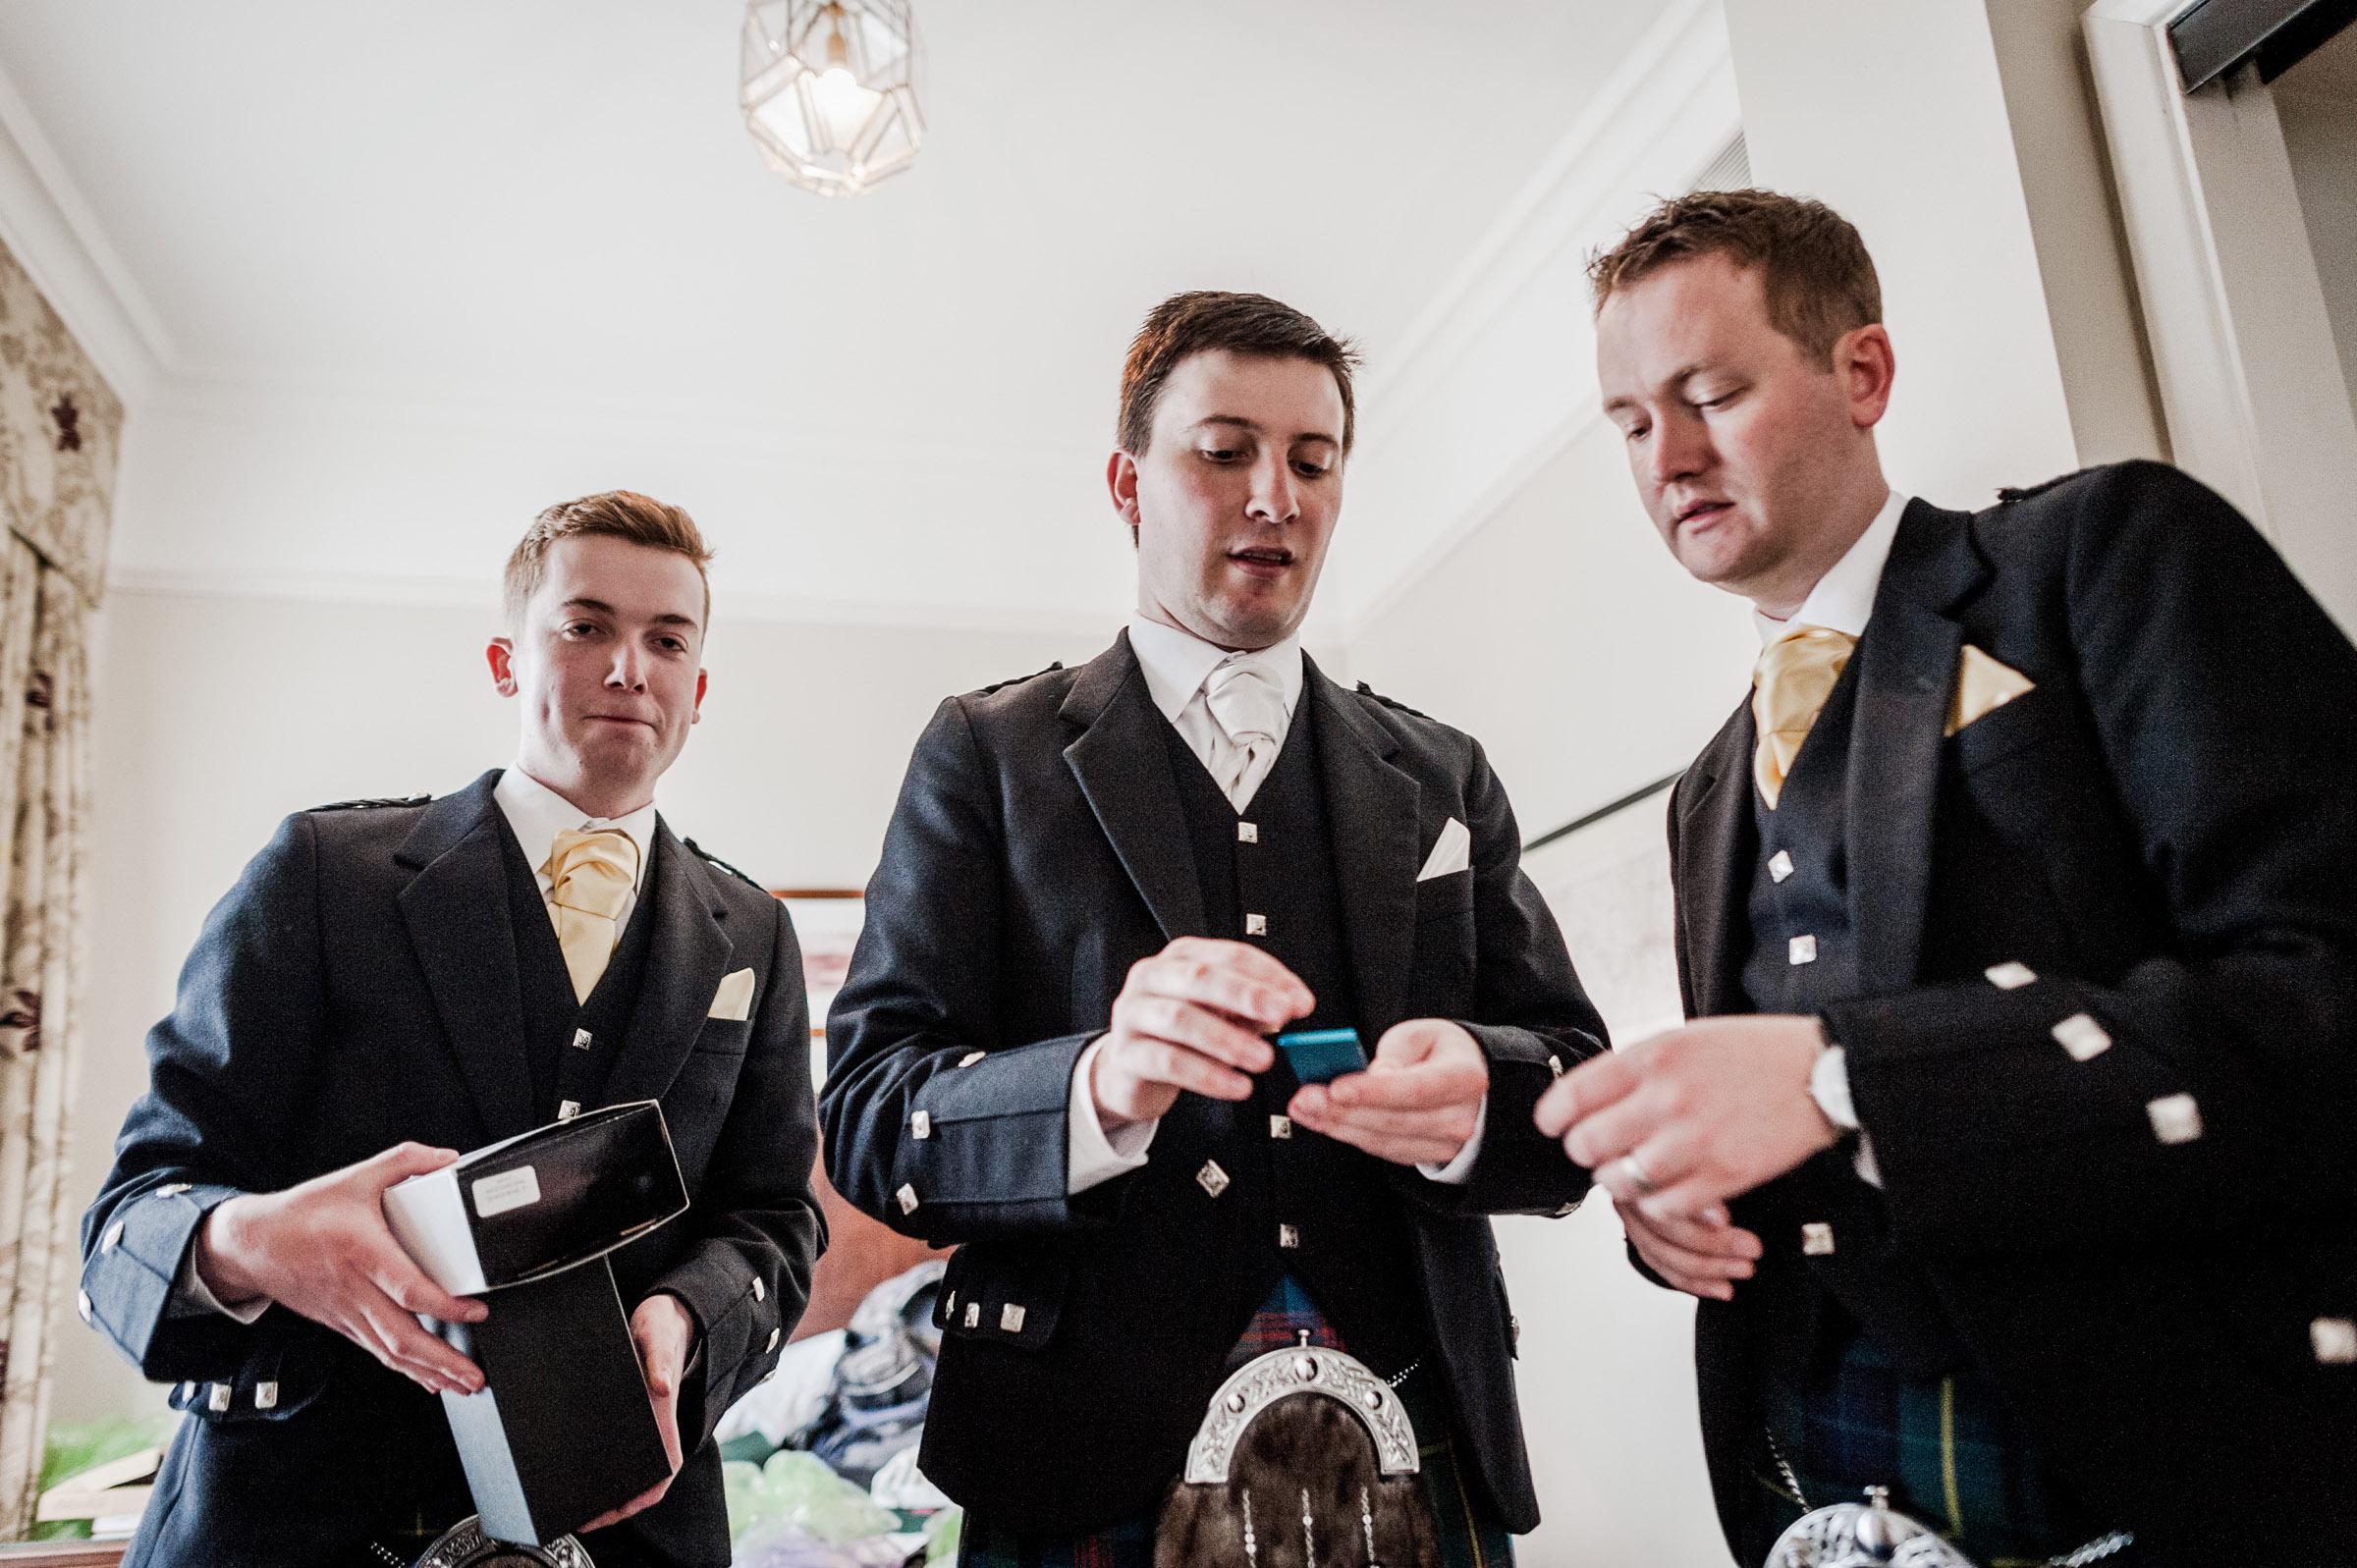 Ashmolean-Museum-Wedding-Pictures-0013.jpg